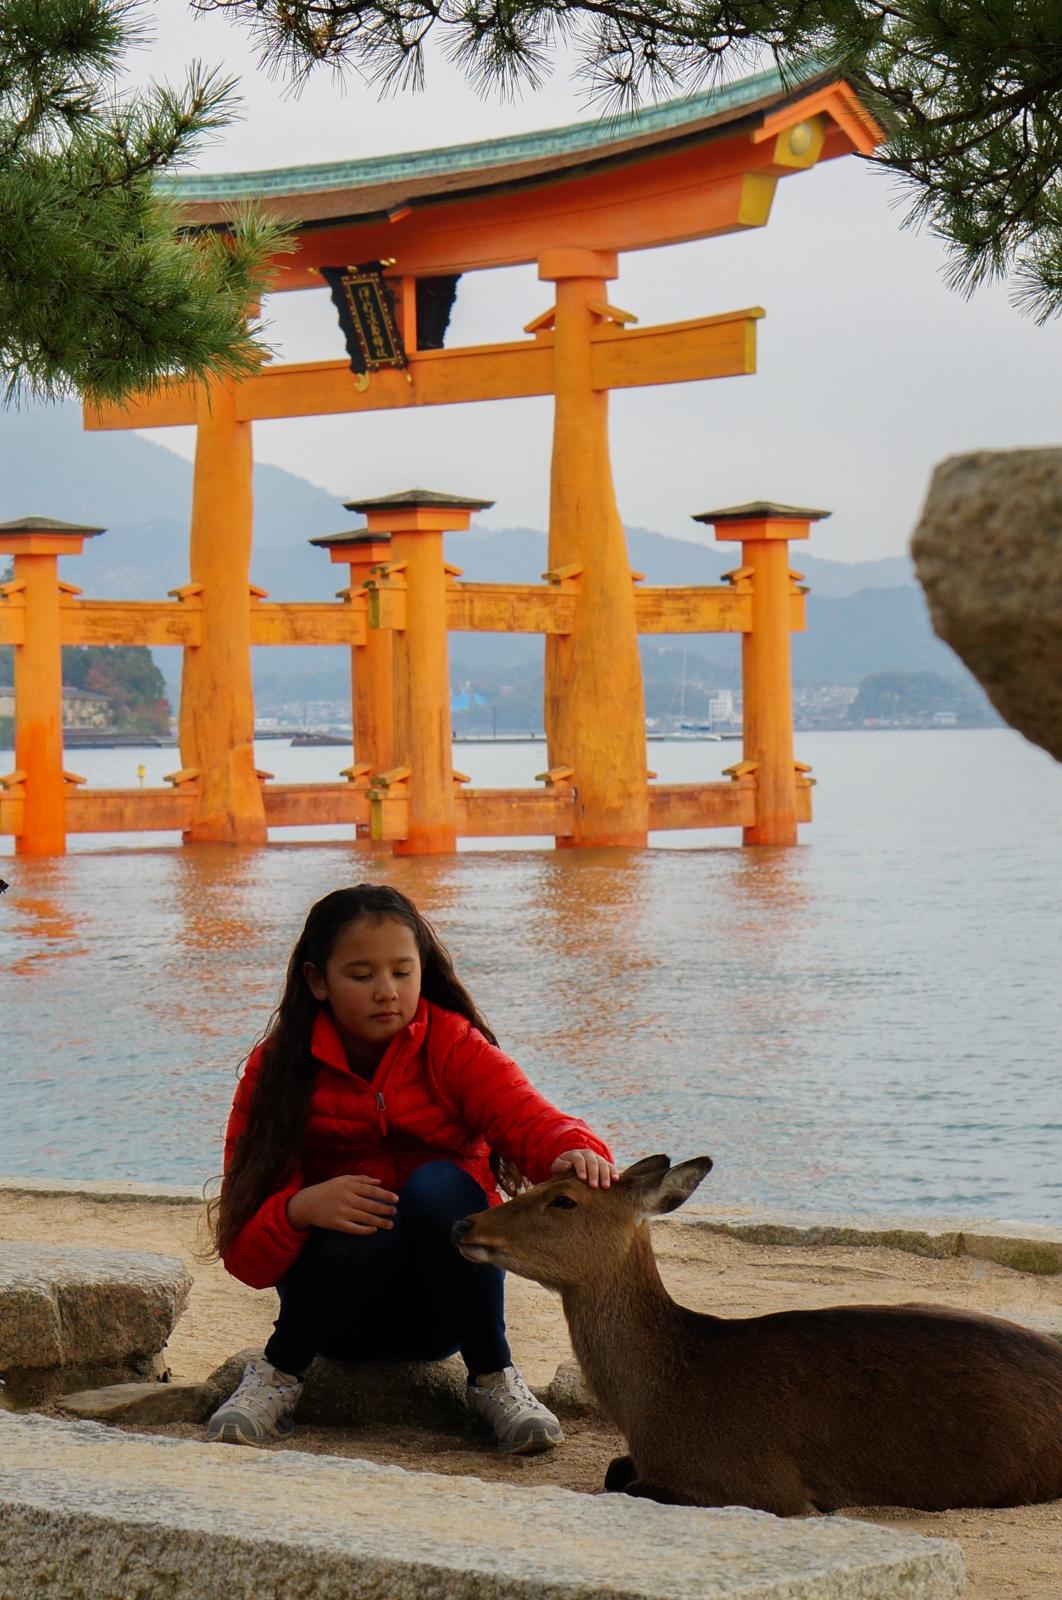 miyajima, voyage japon, île miyajima, torii flottant, torii mer